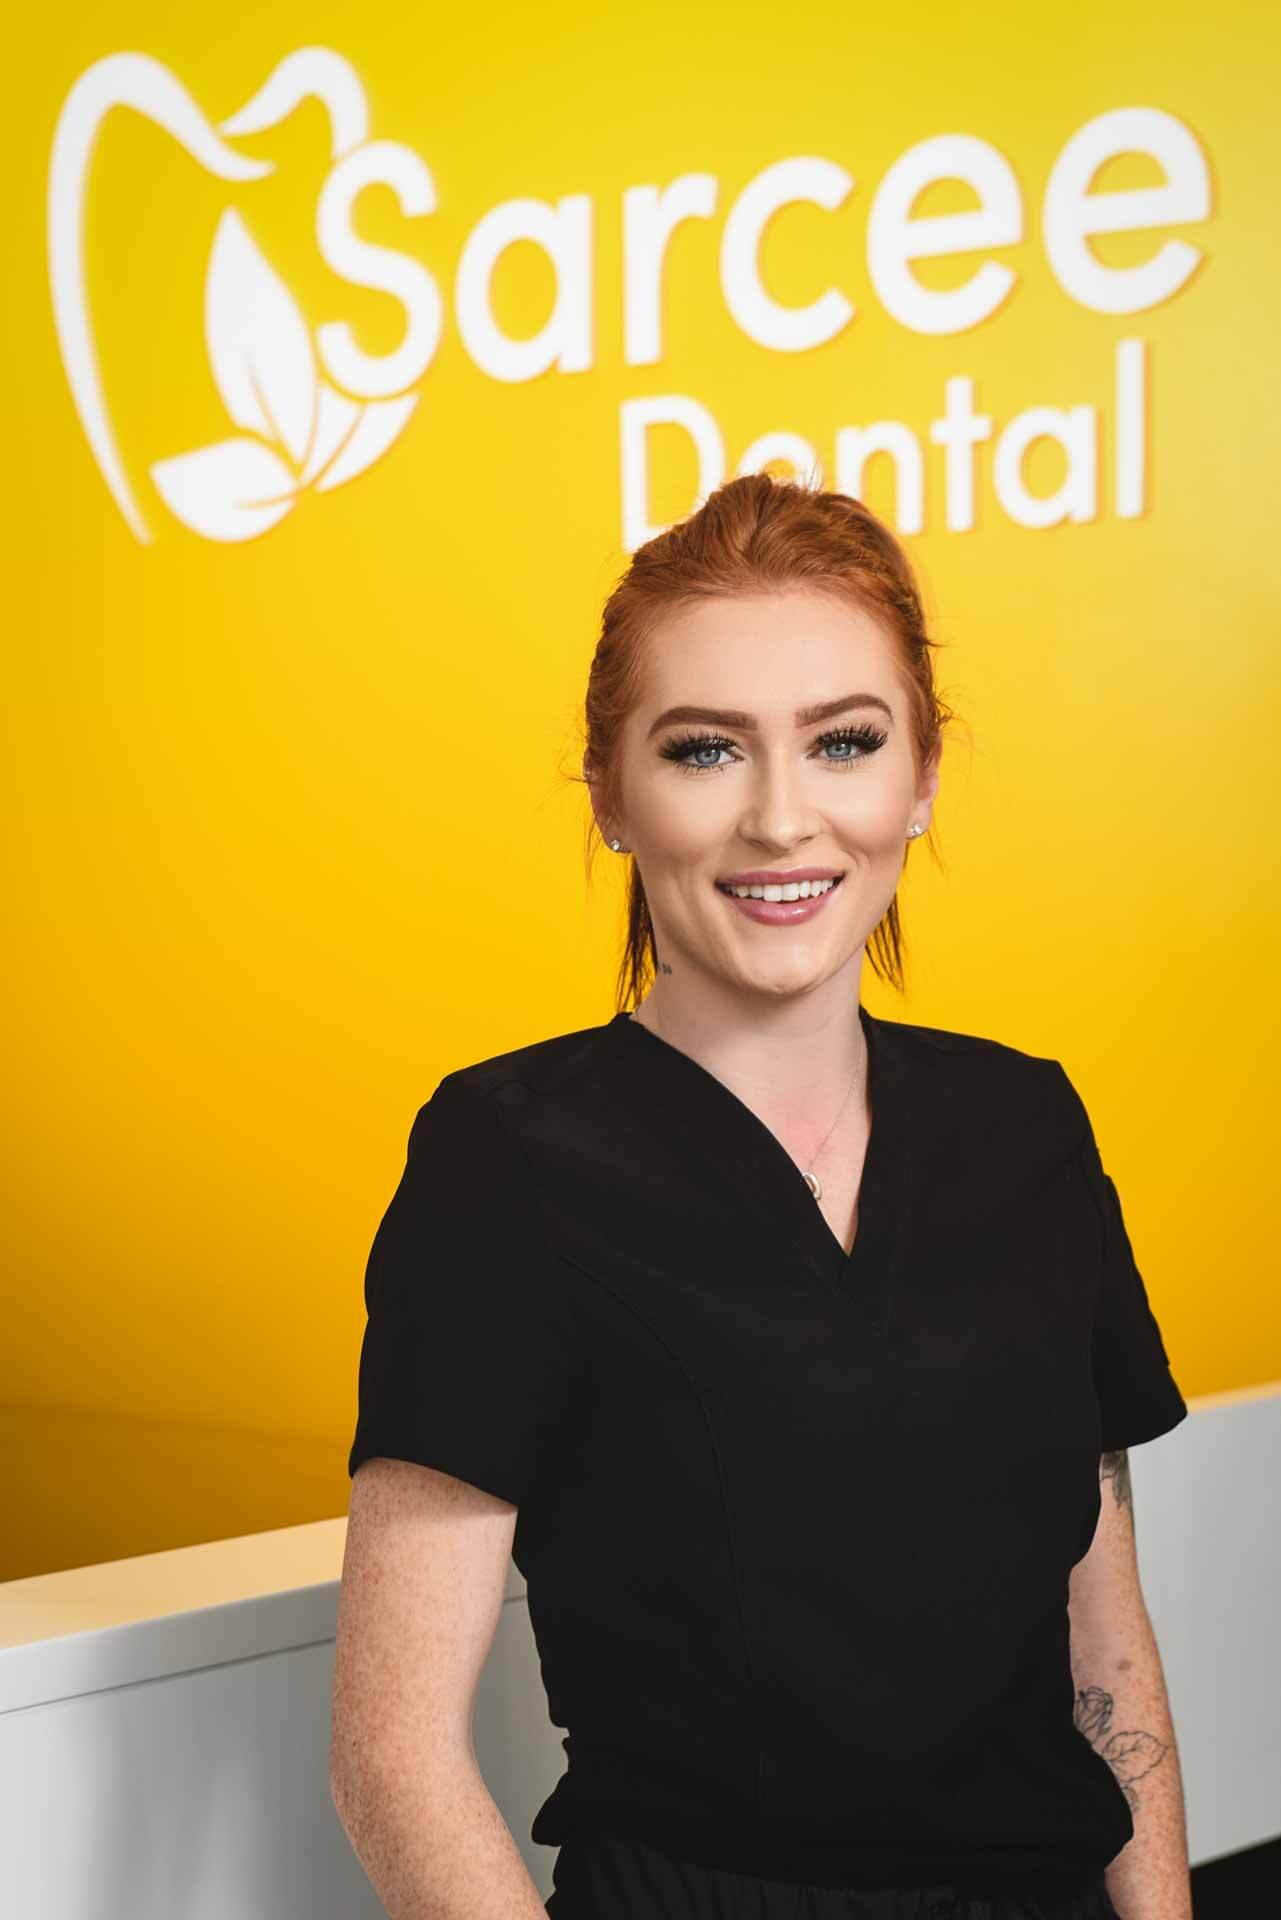 Shantelle - RDA | Sarcee Dental | NW Calgary | General and Family Dentist